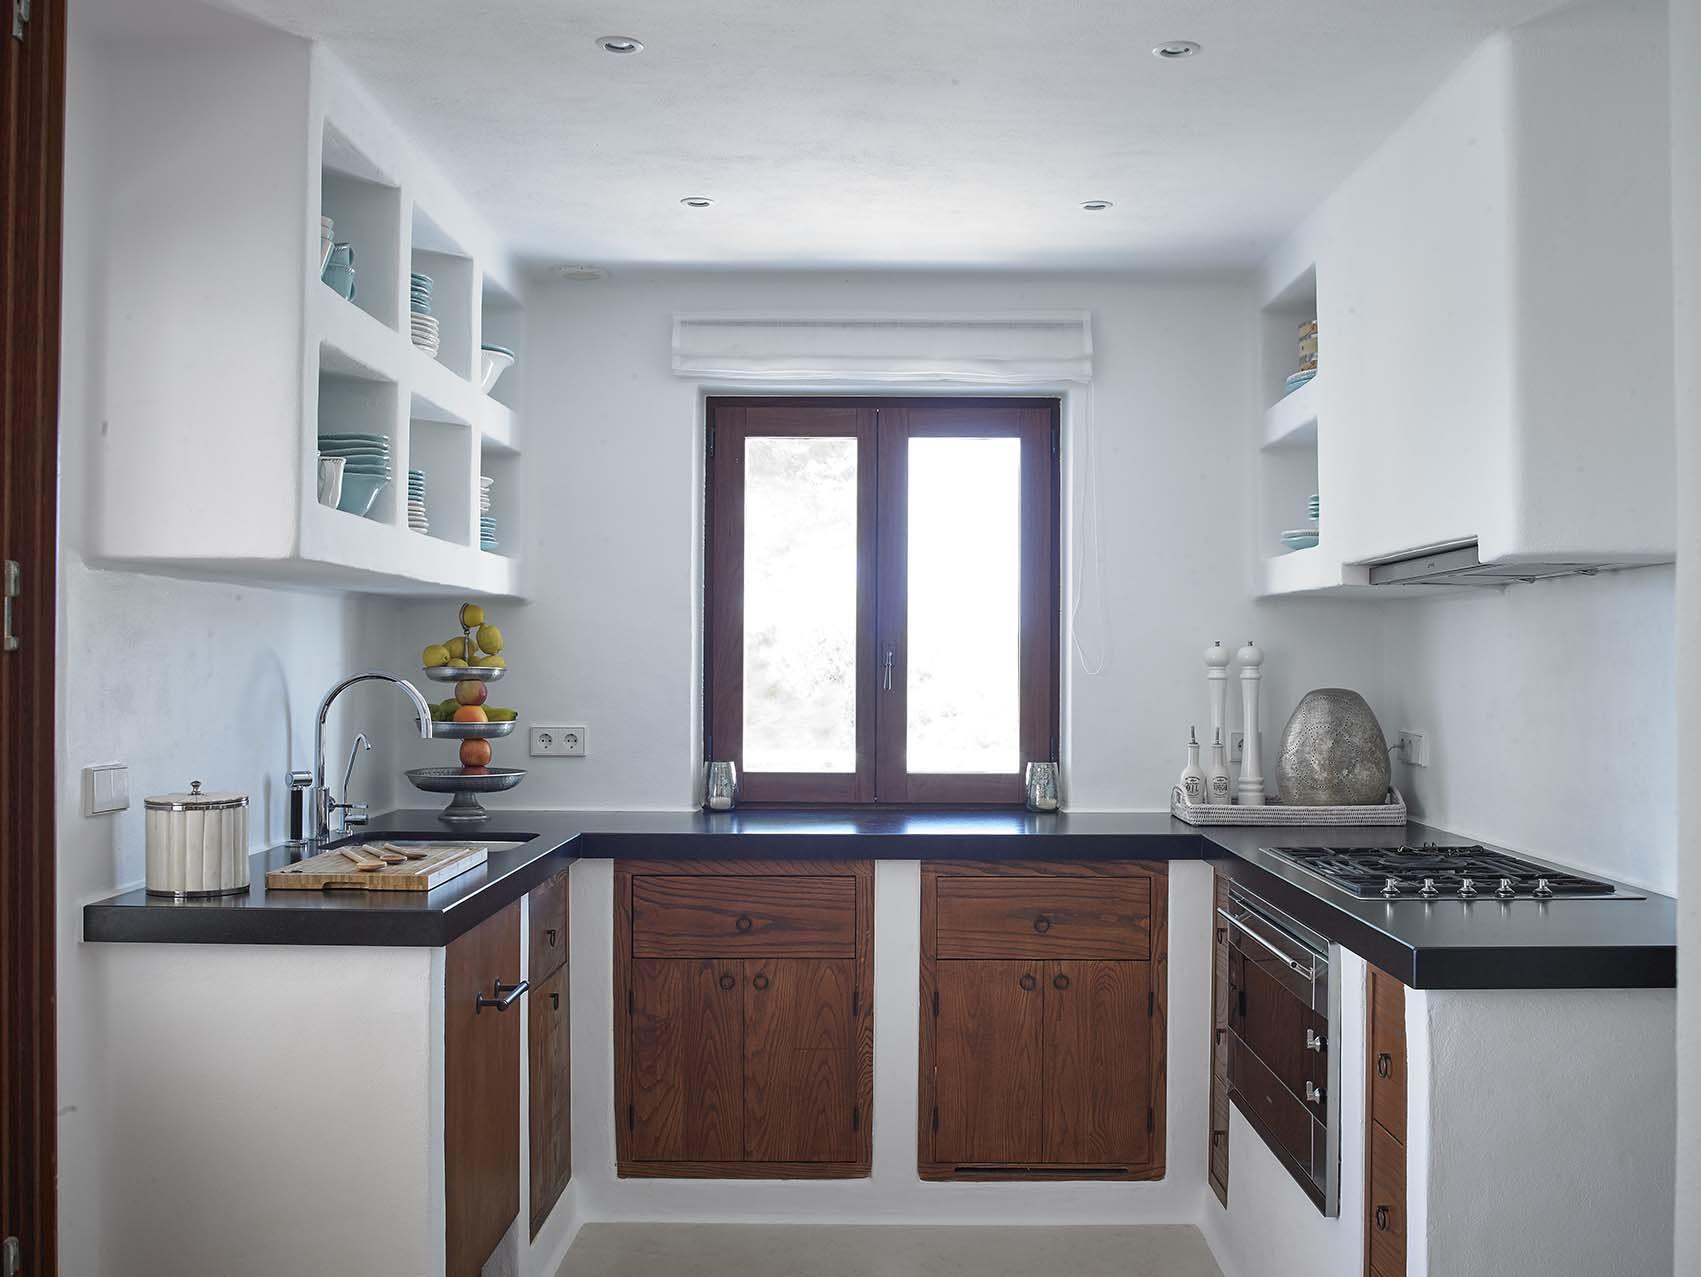 Blakstad Design Consultants Projects Kitchen Design Replacing Kitchen Countertops Kitchen Projects